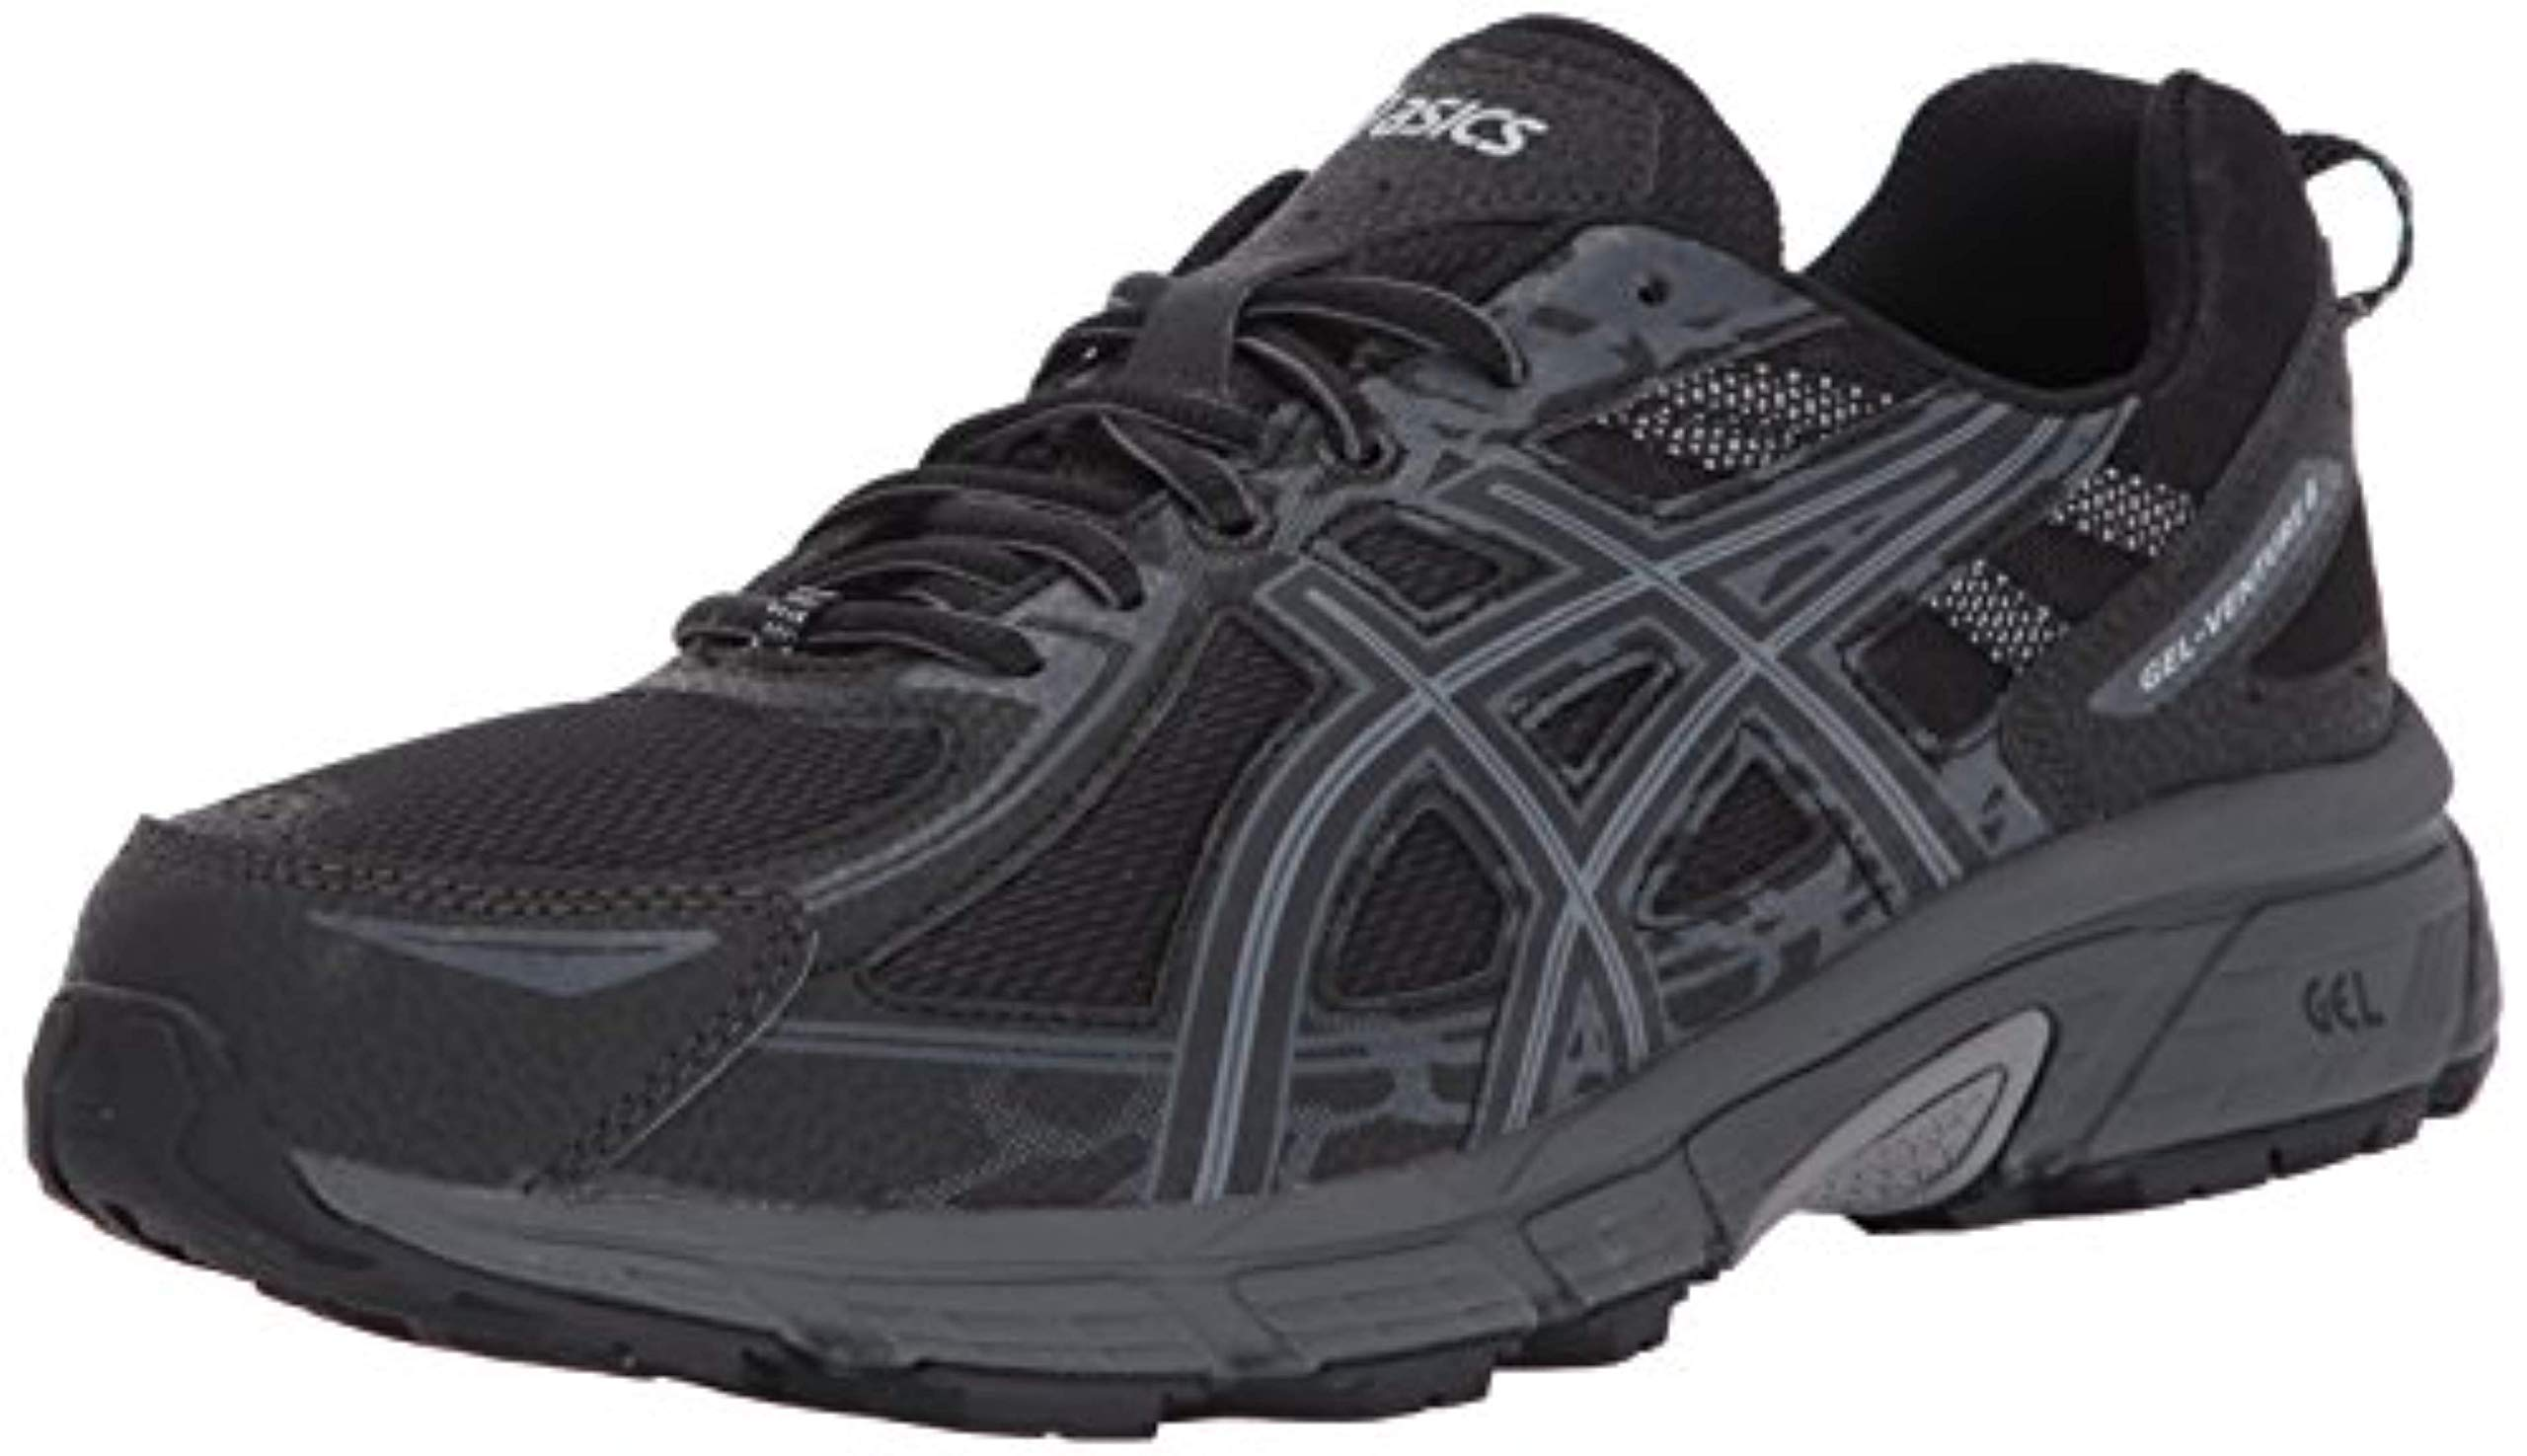 ASICS Mens Gel-Venture 6 Running Shoe, Black/Phantom/Mid Grey, 9.5 by ASICS